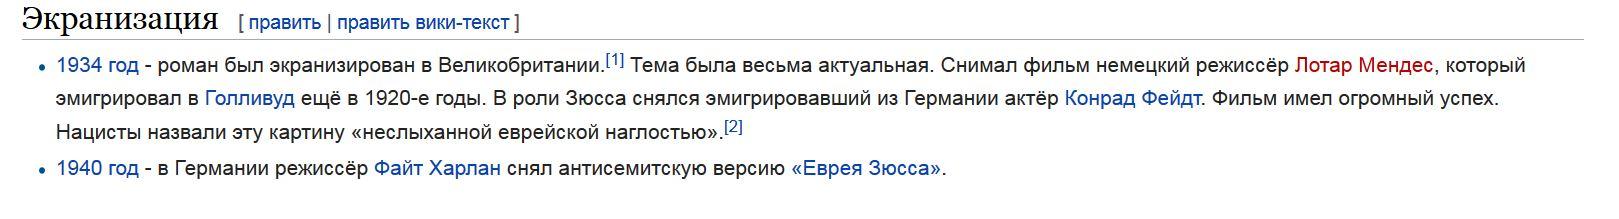 http://s5.uploads.ru/6y3HL.jpg